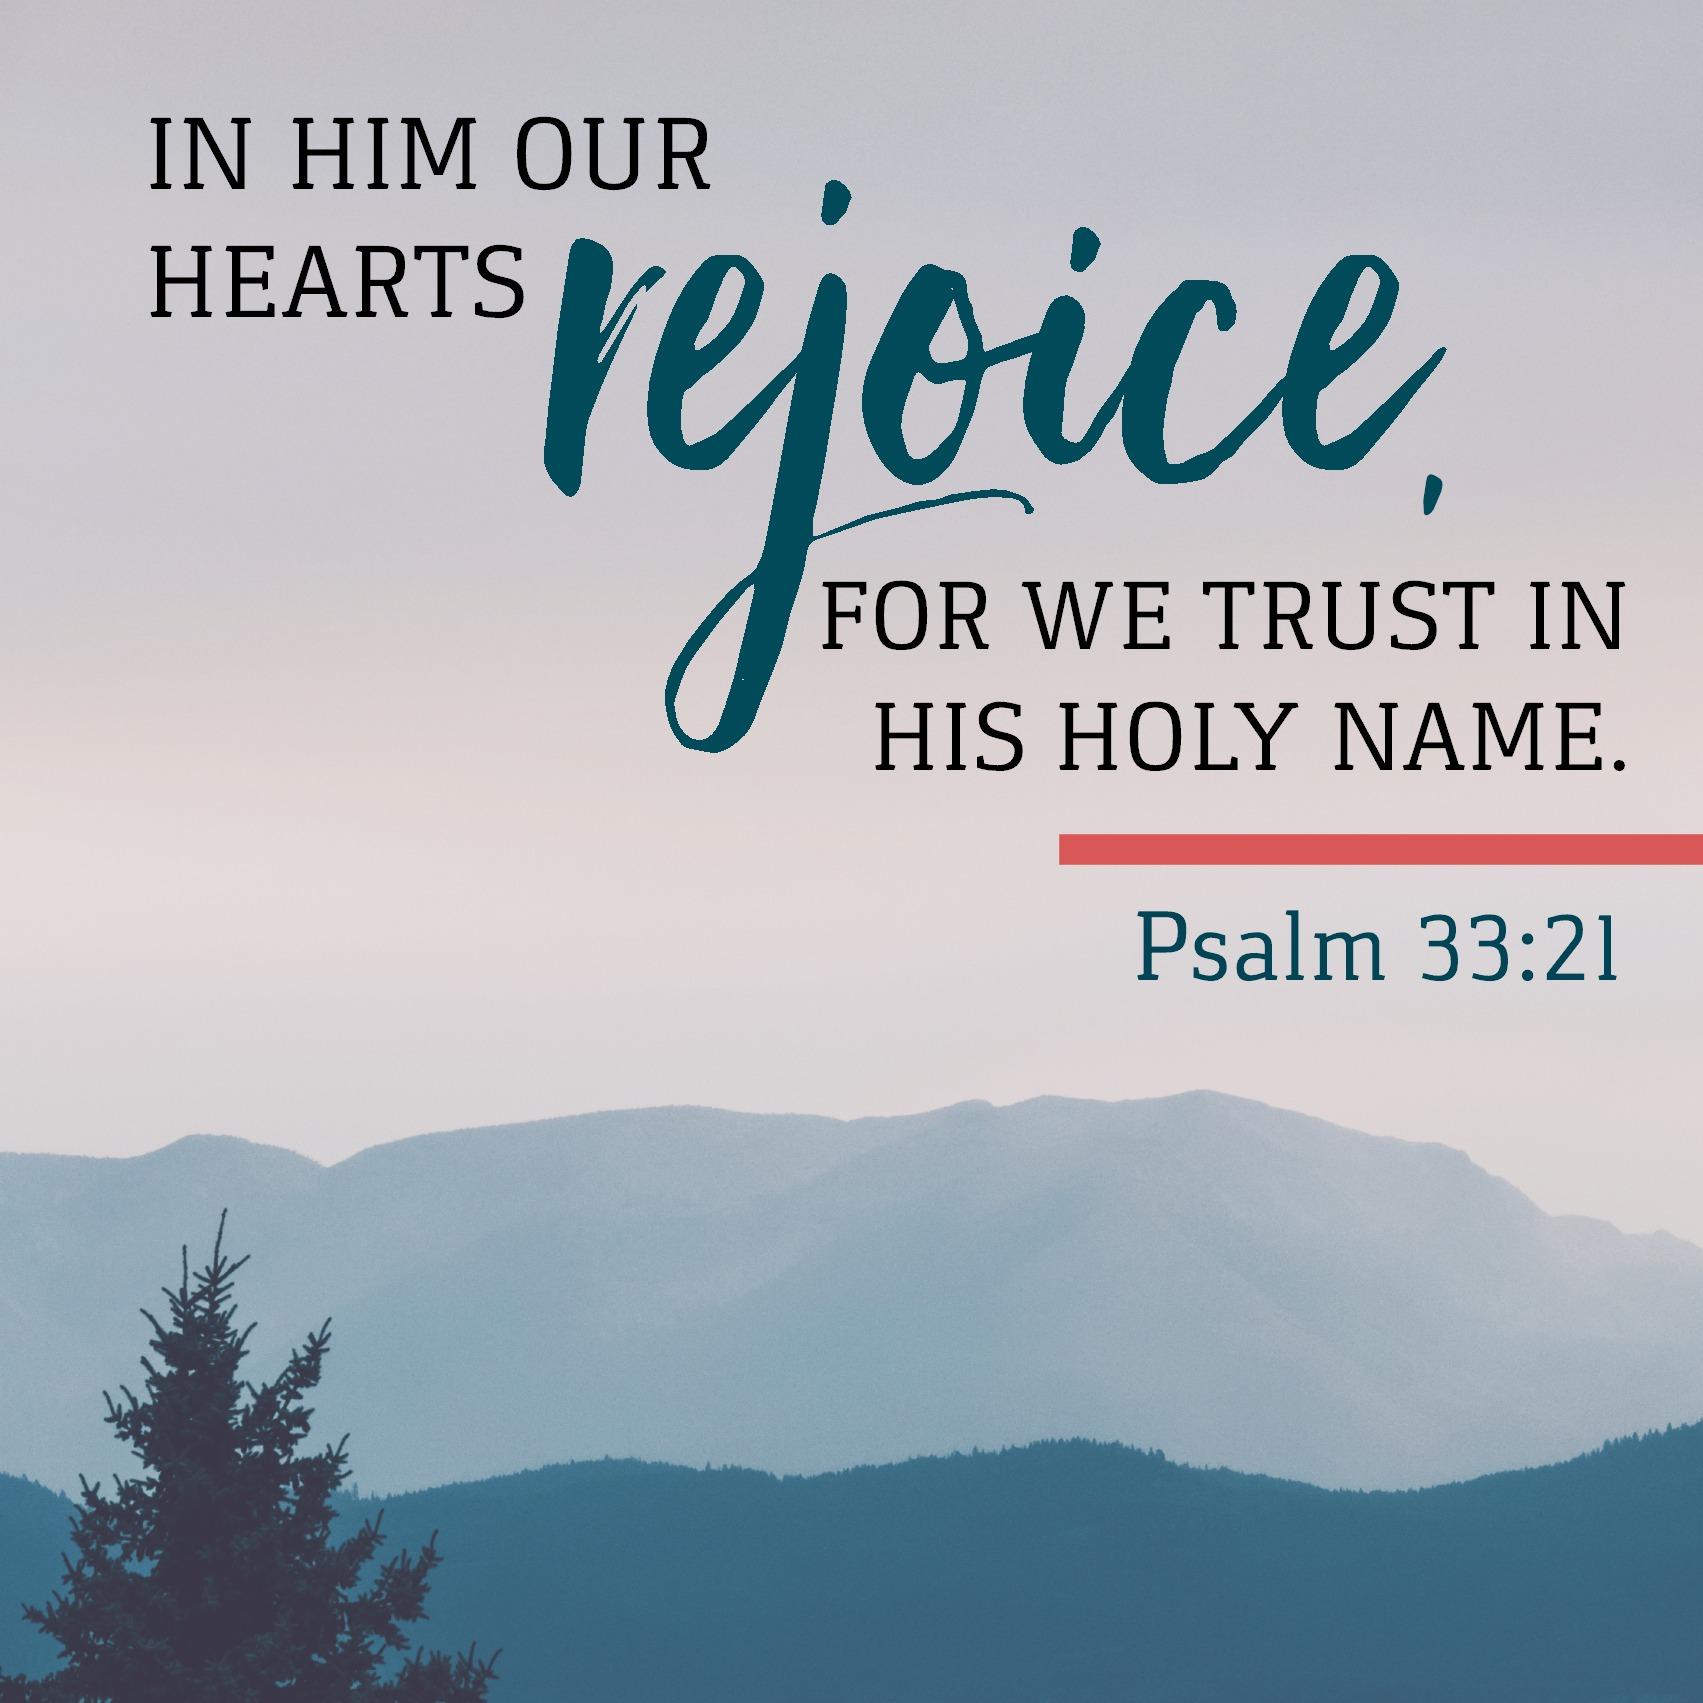 Psalm 33:21